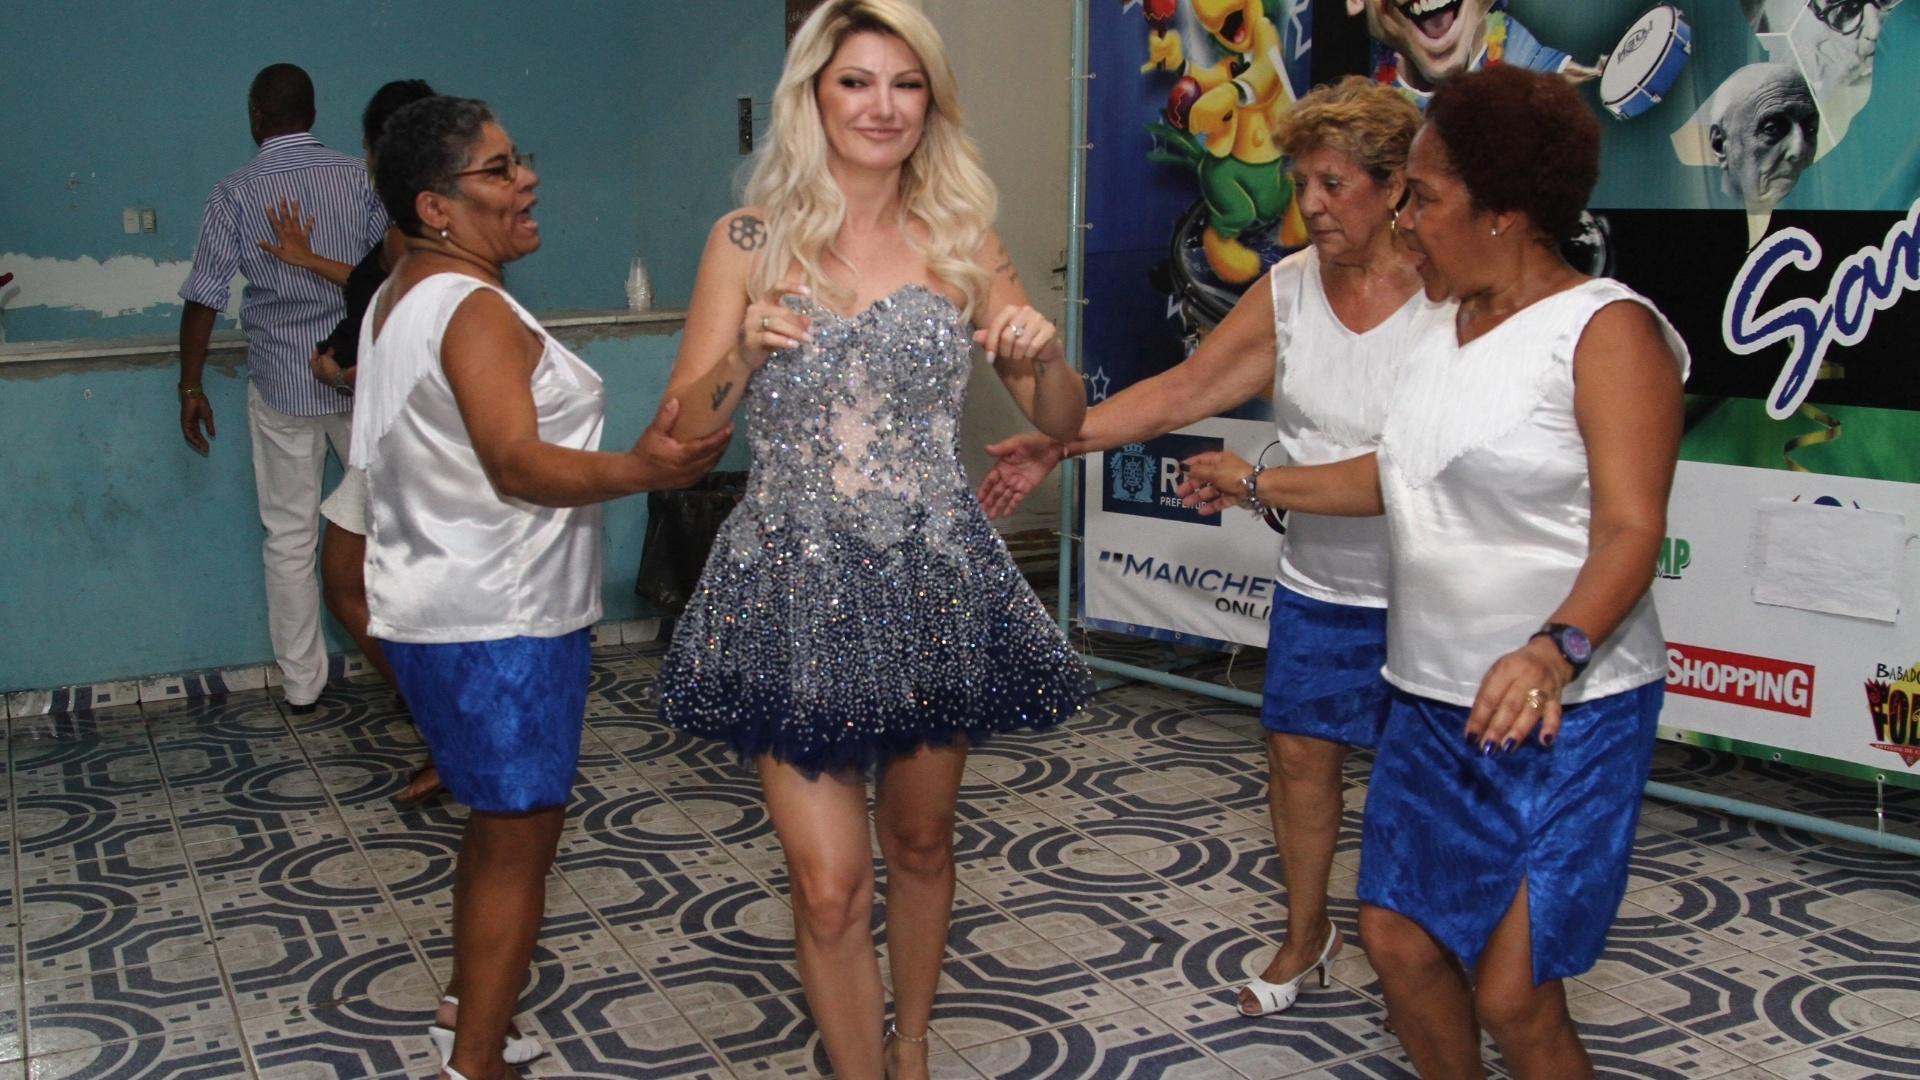 15.nov.2015 - Antônia Fontenelle posa com integrantes da Caprichosos de Pilares